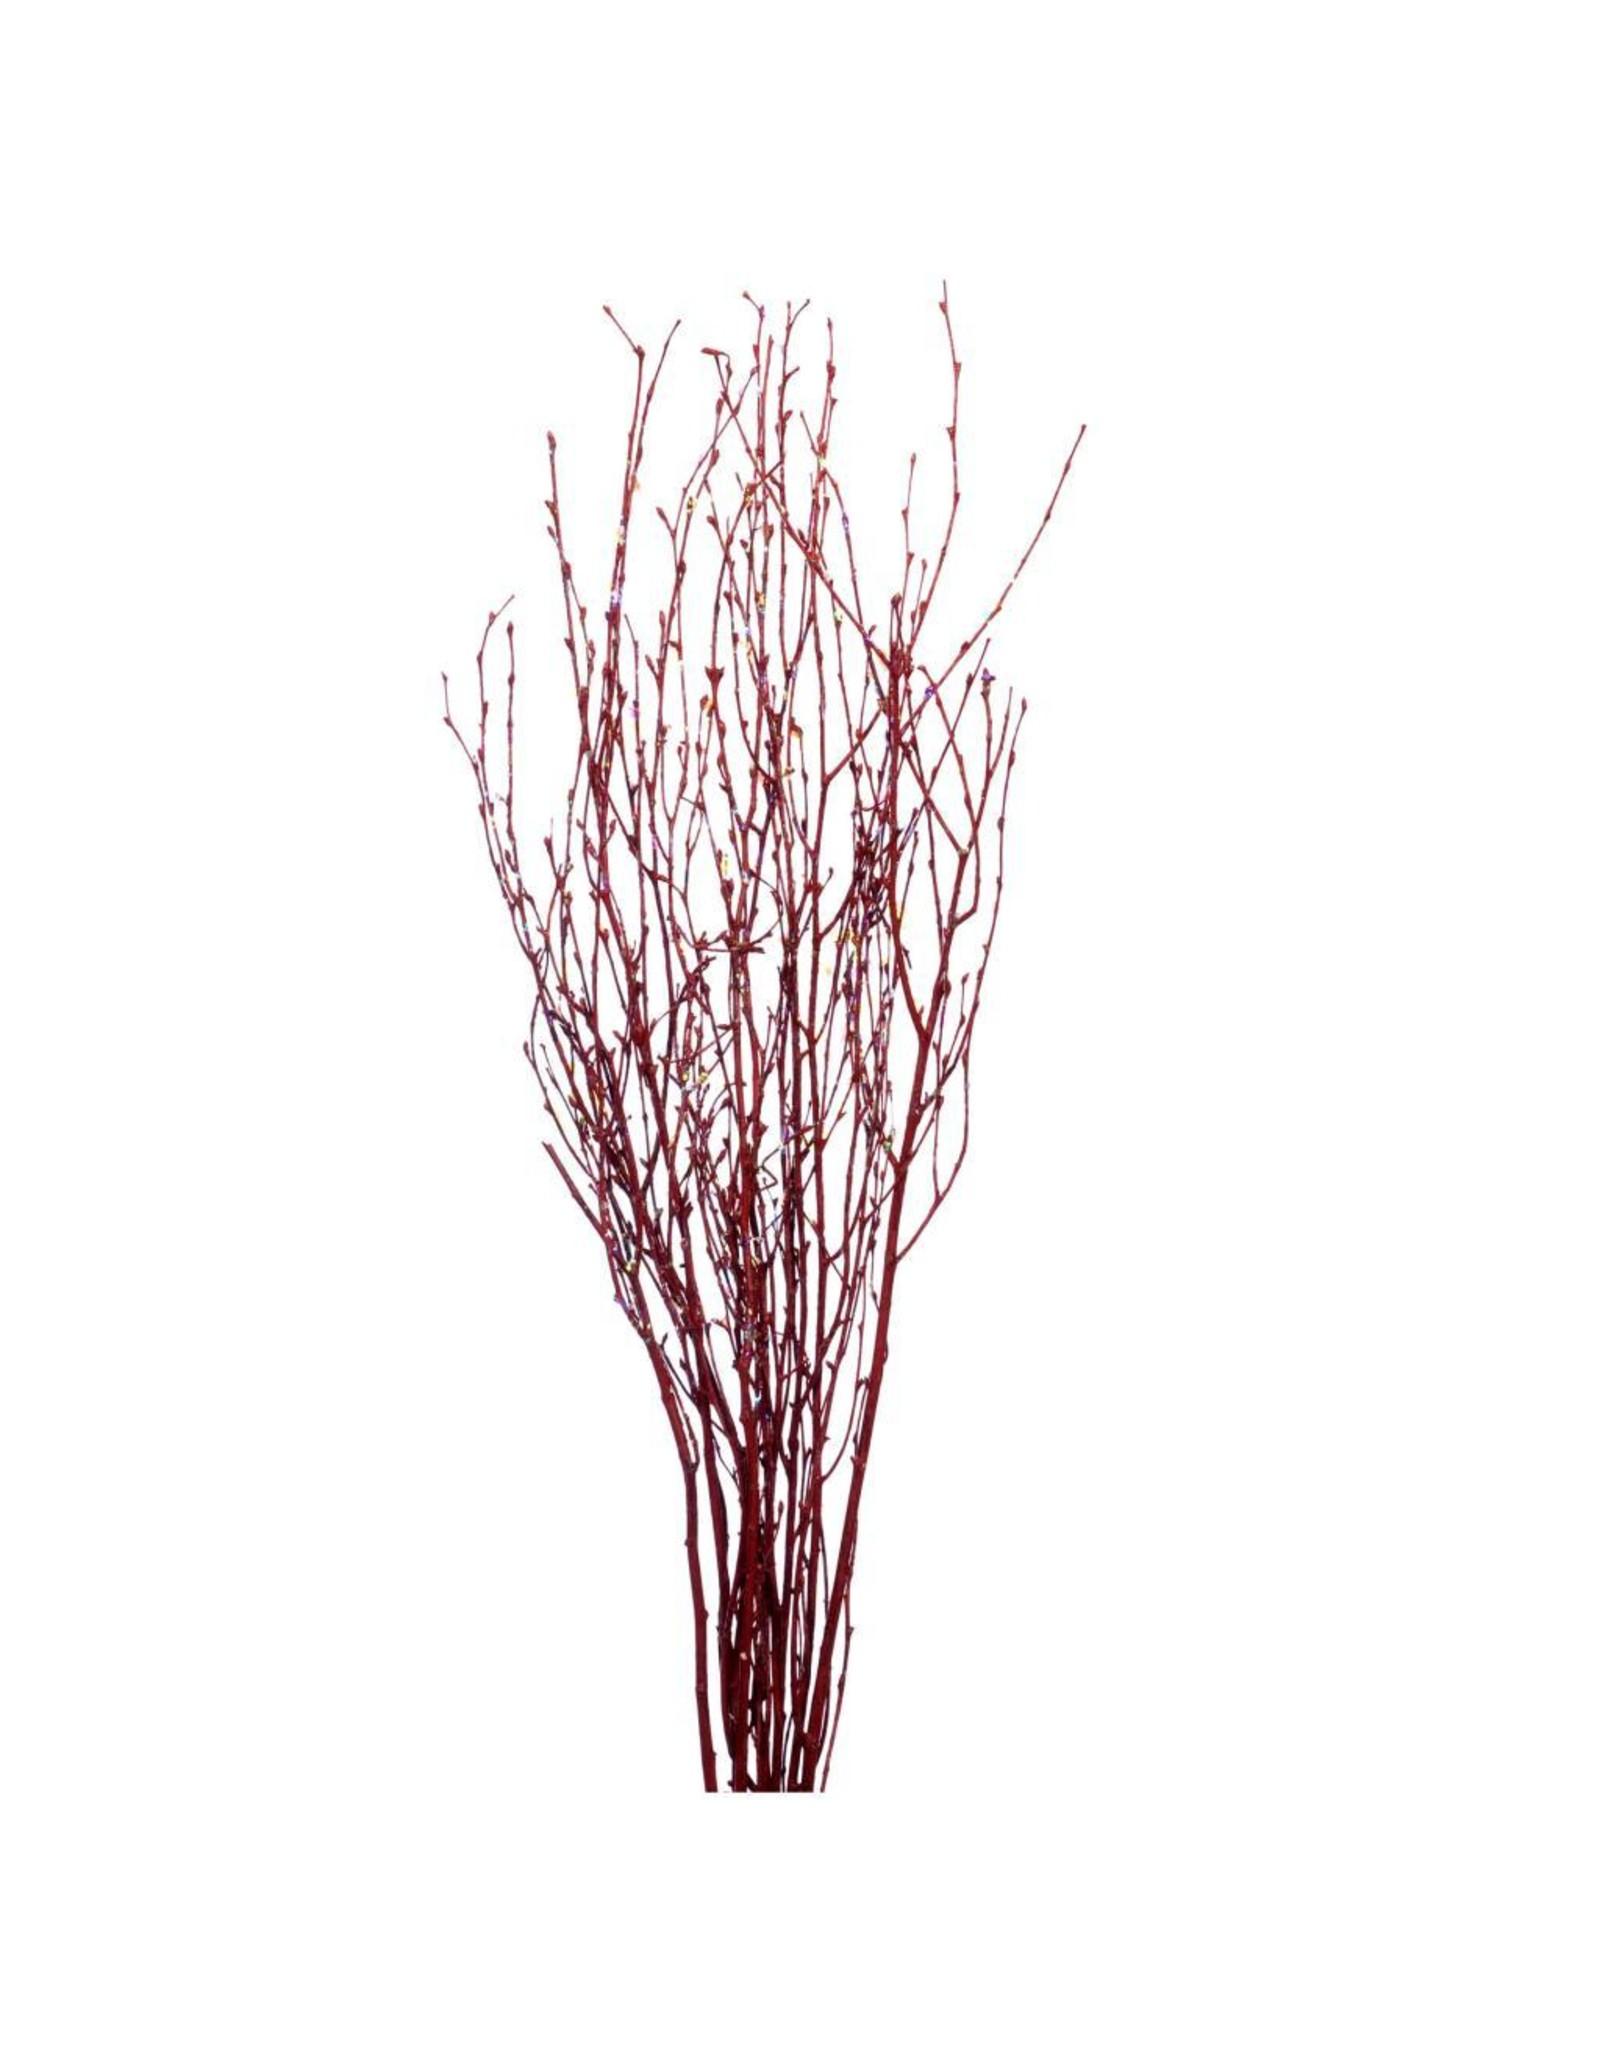 Birch 115cm 3pc red red glitter x 35